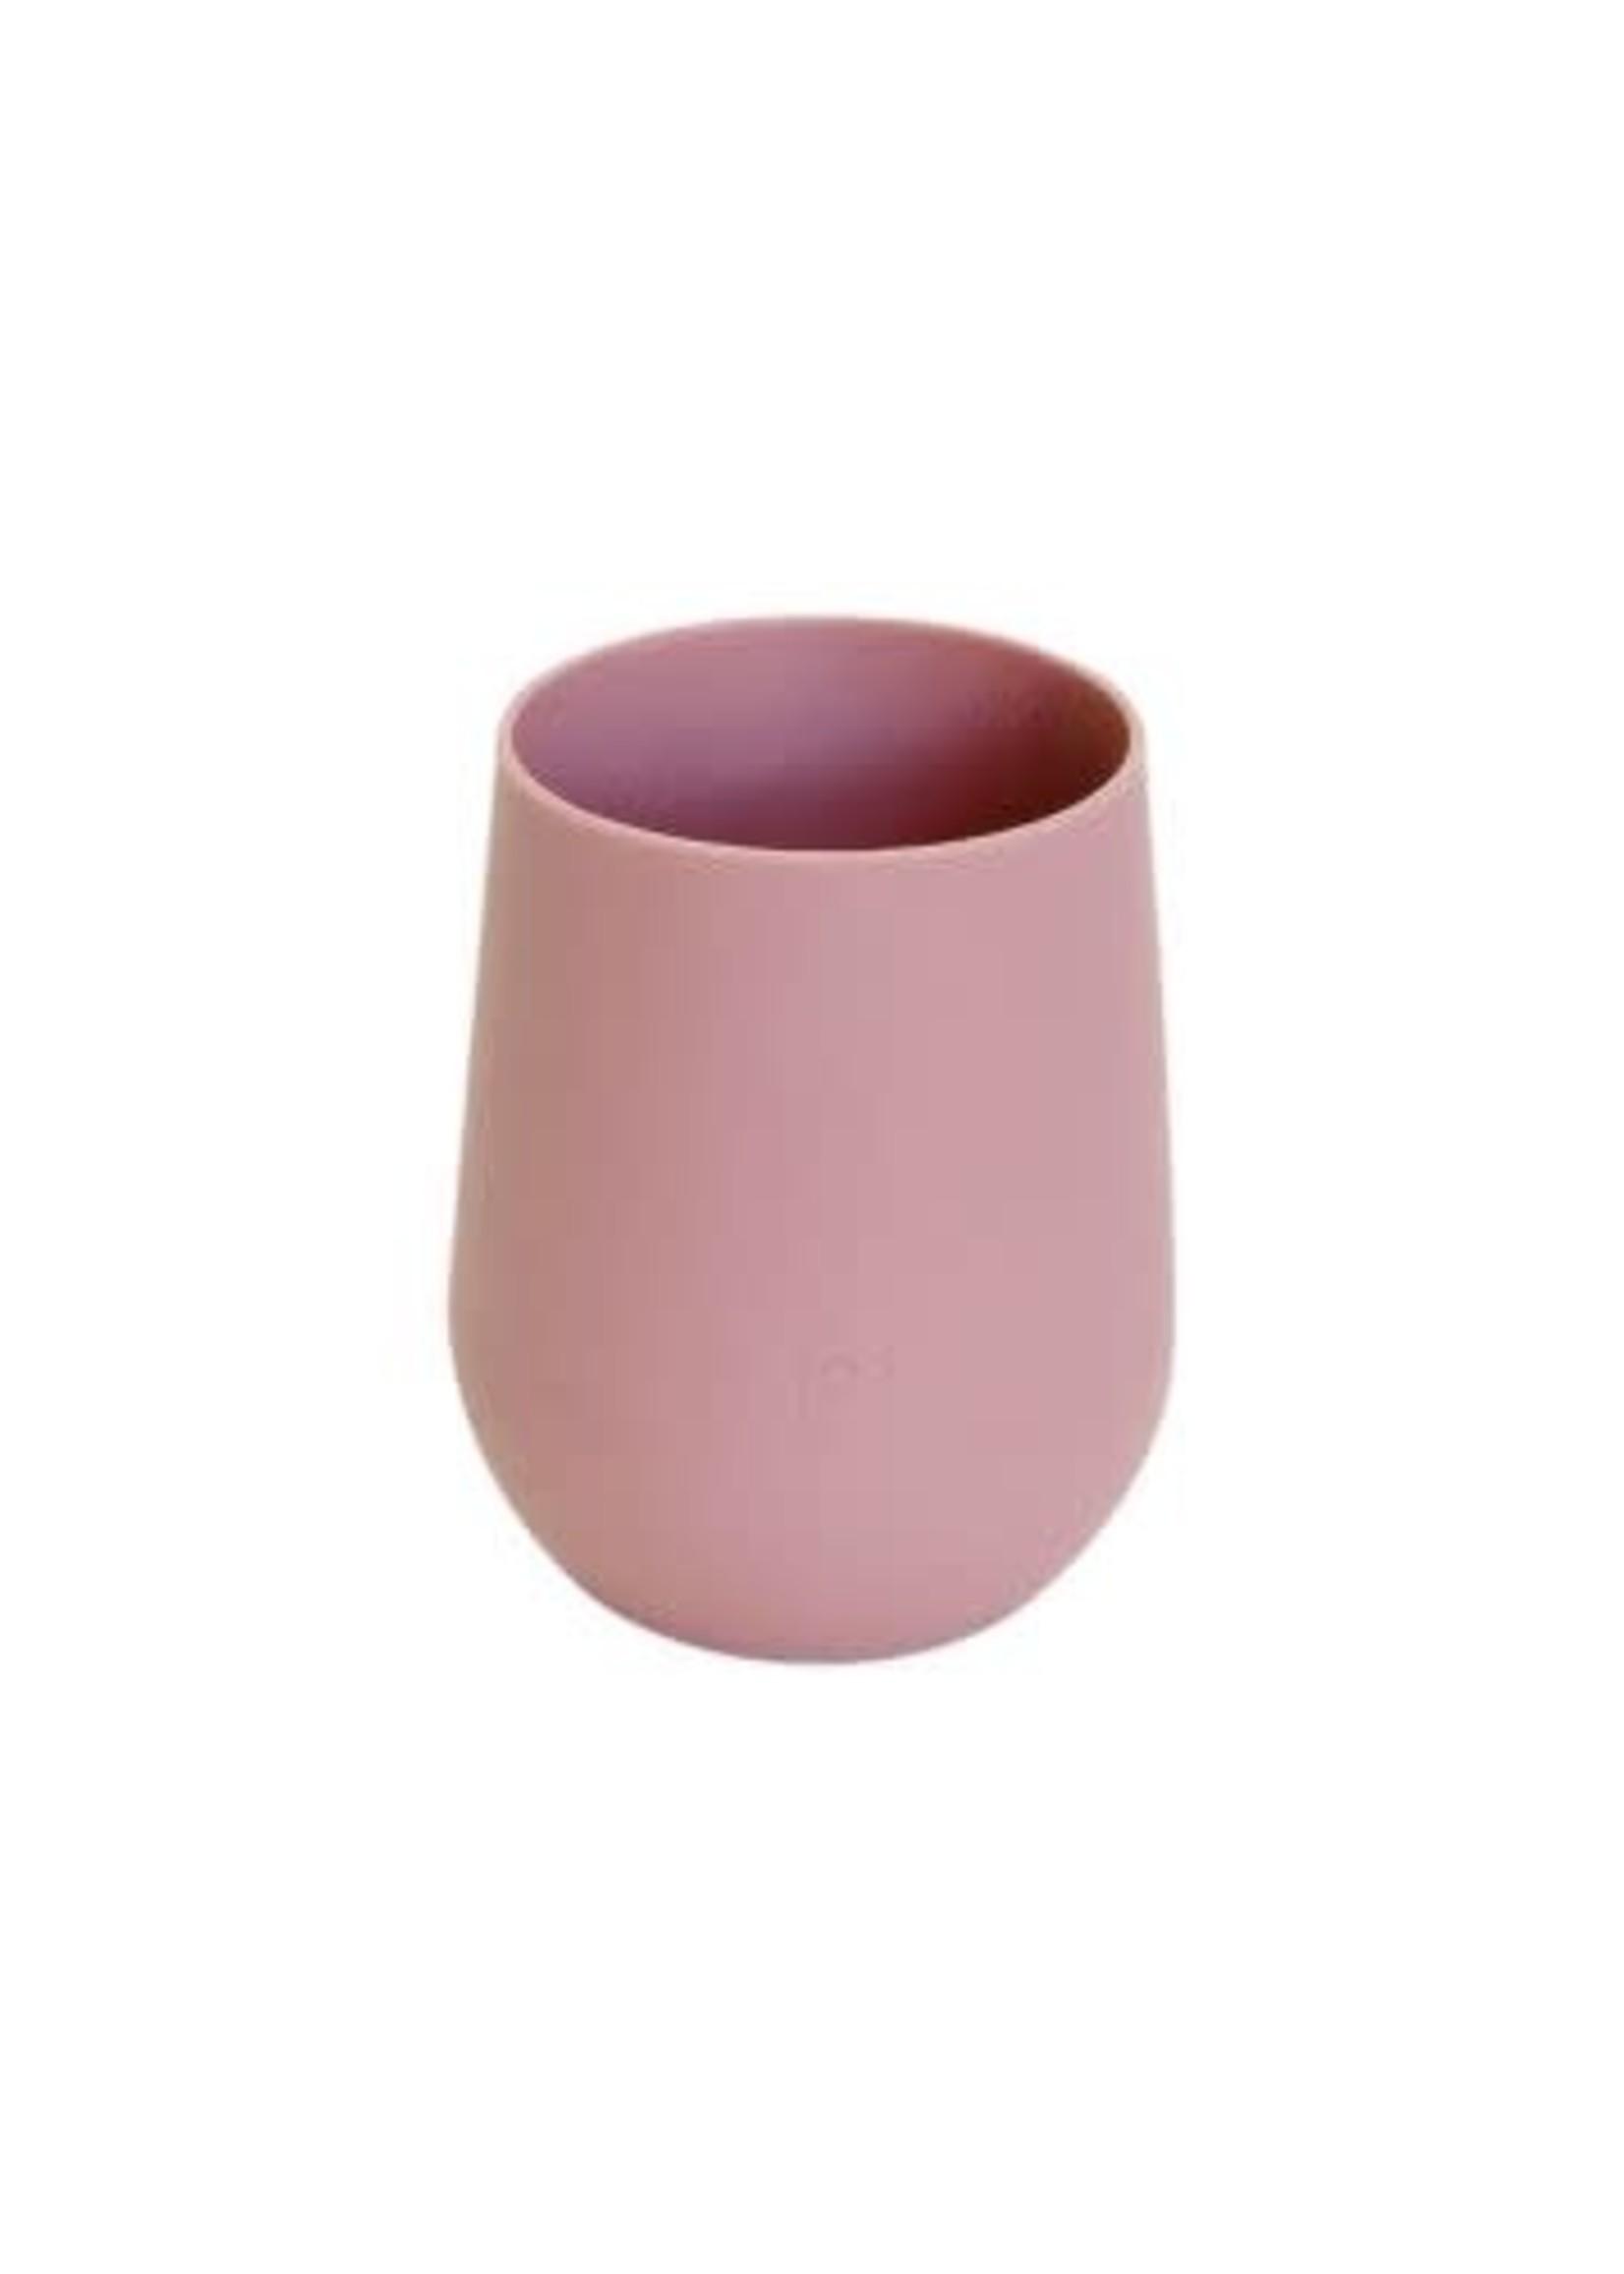 EZPZ ezpz Mini Cup (Blush)